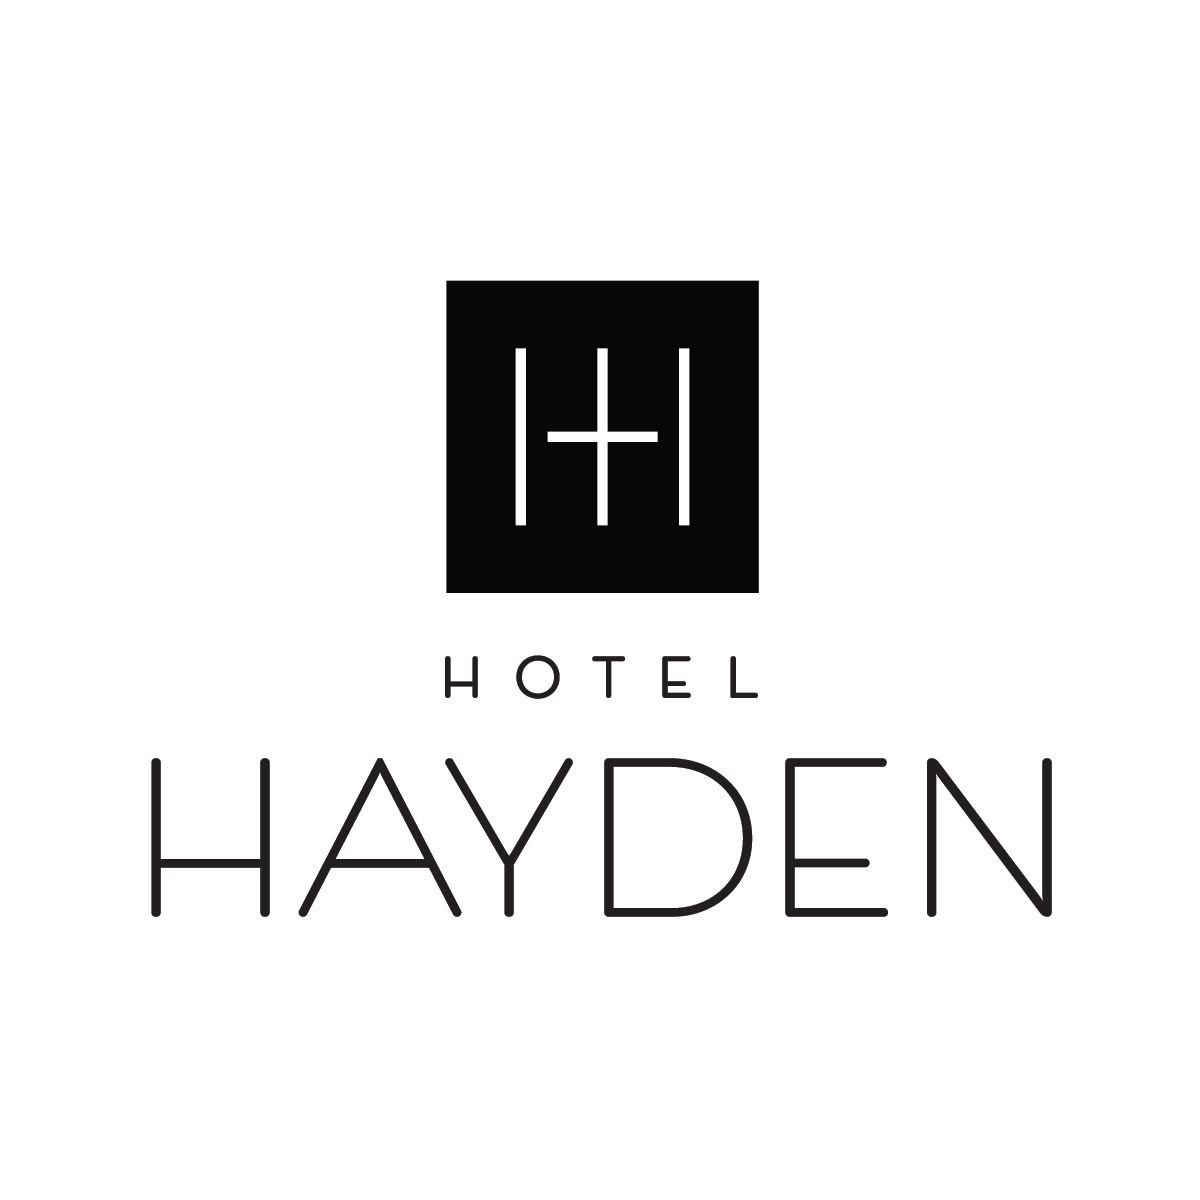 Hotel Hayden, Metropolitan Pavilion hotel partner